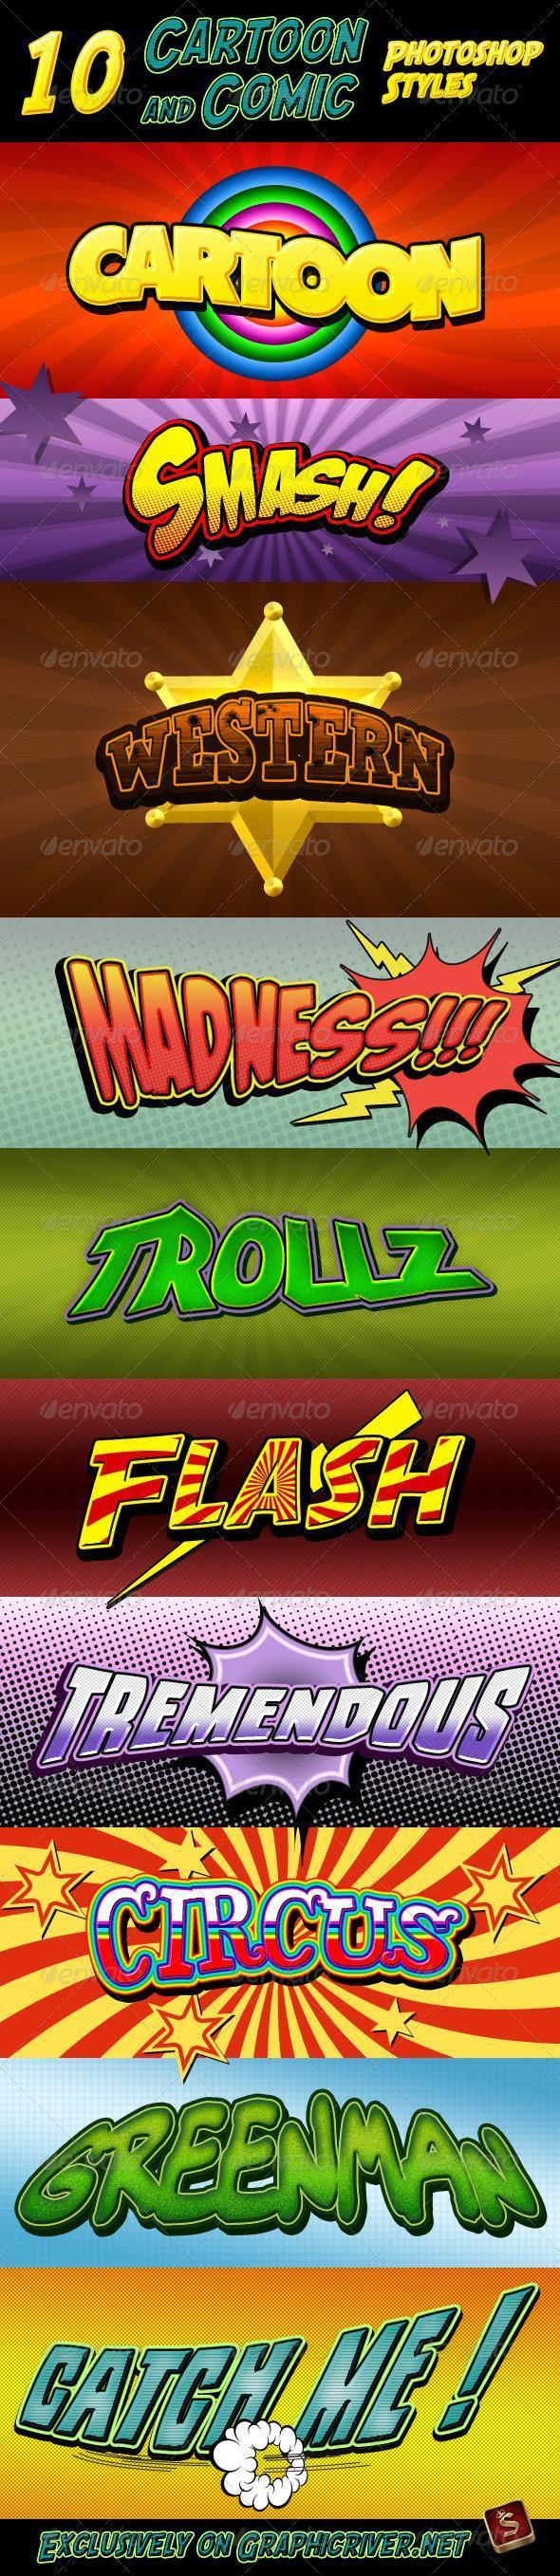 Cartoon Comic Photoshop Styles